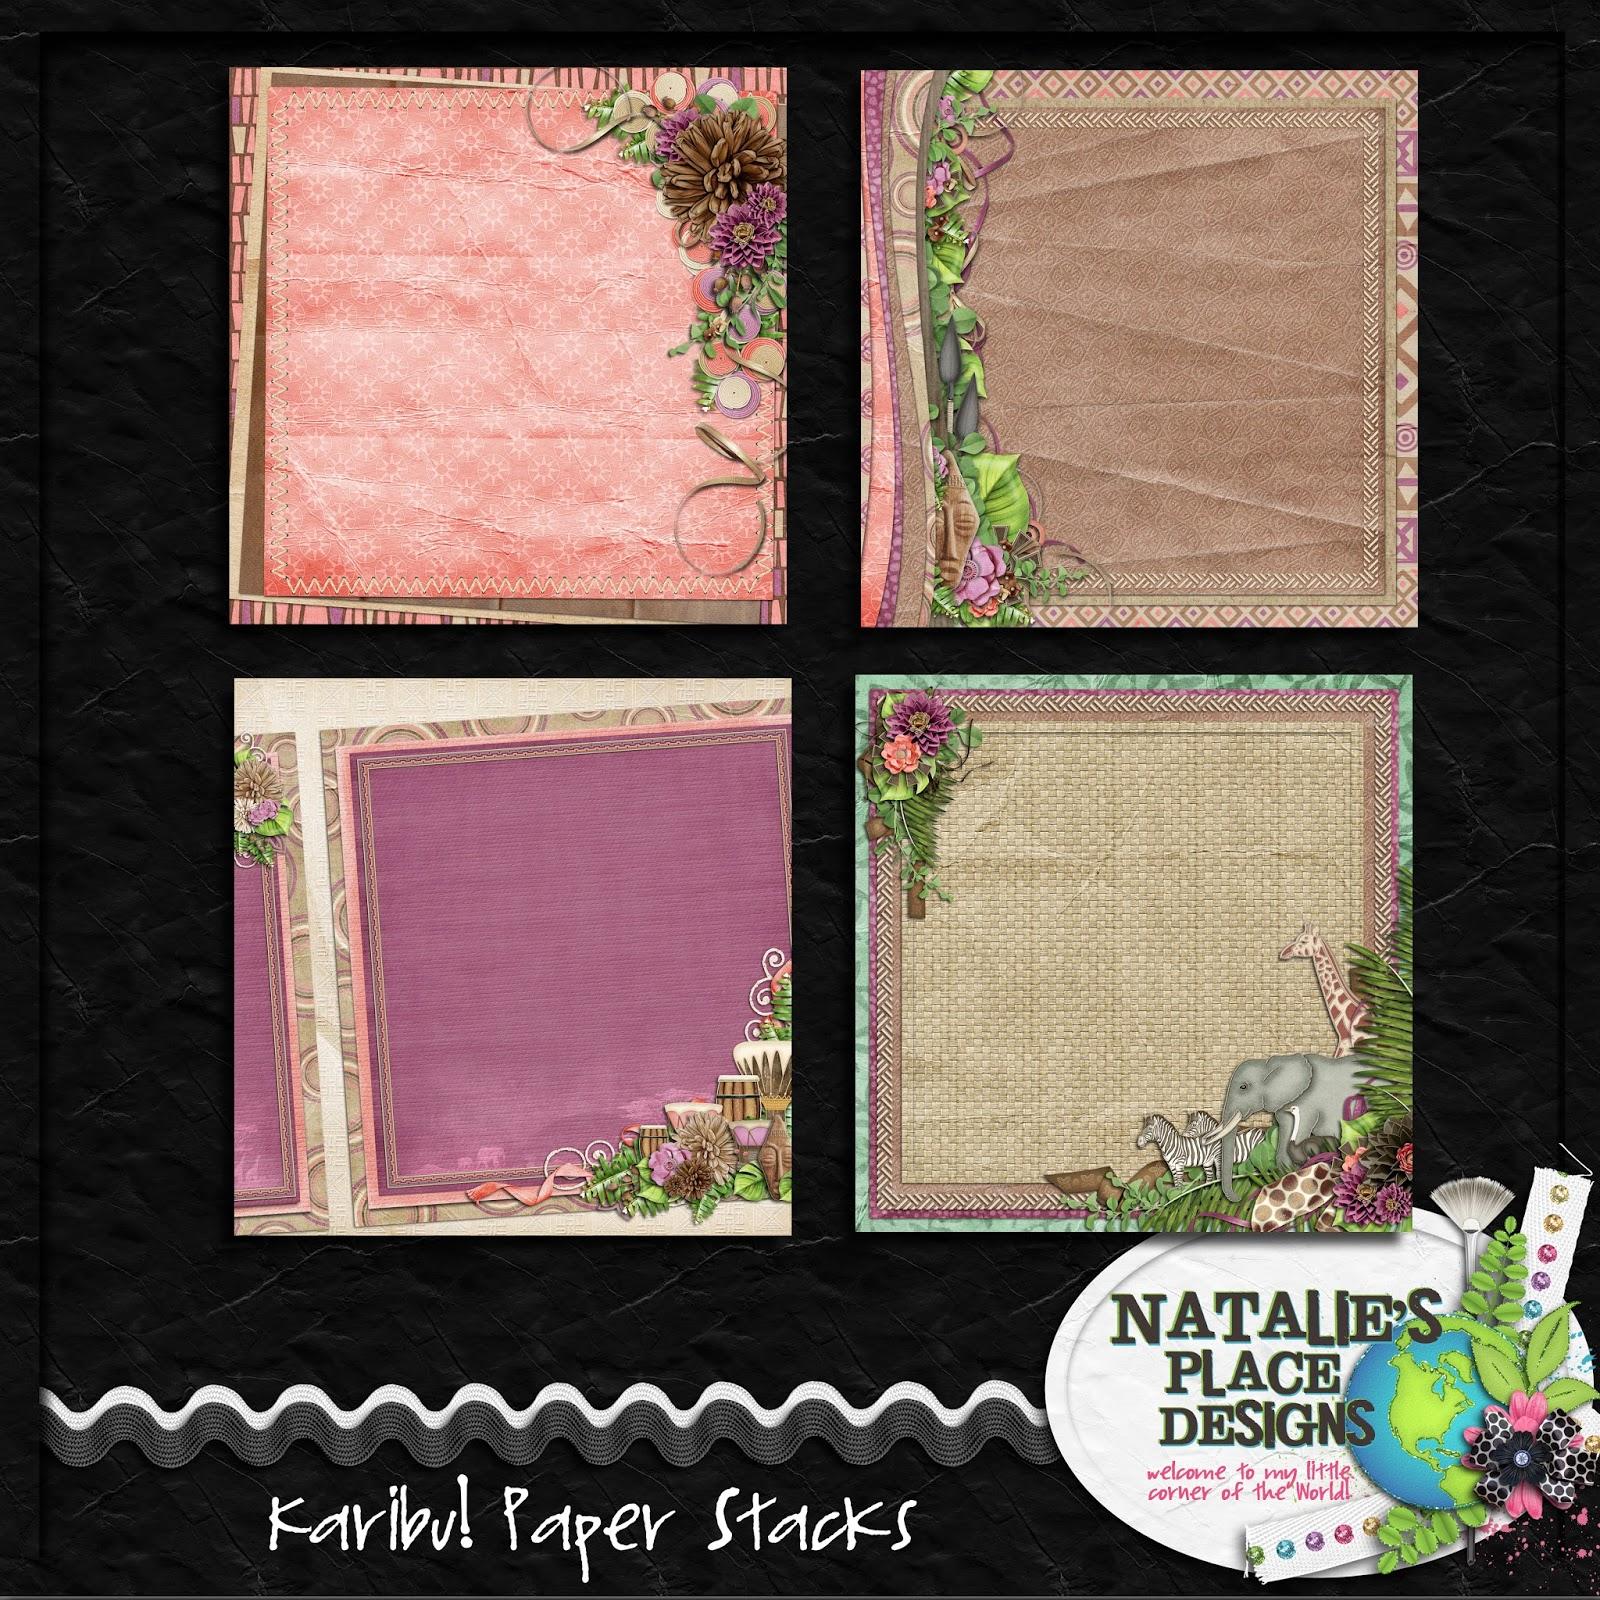 http://www.nataliesplacedesigns.com/store/p490/Karibu%21_Bundle.html